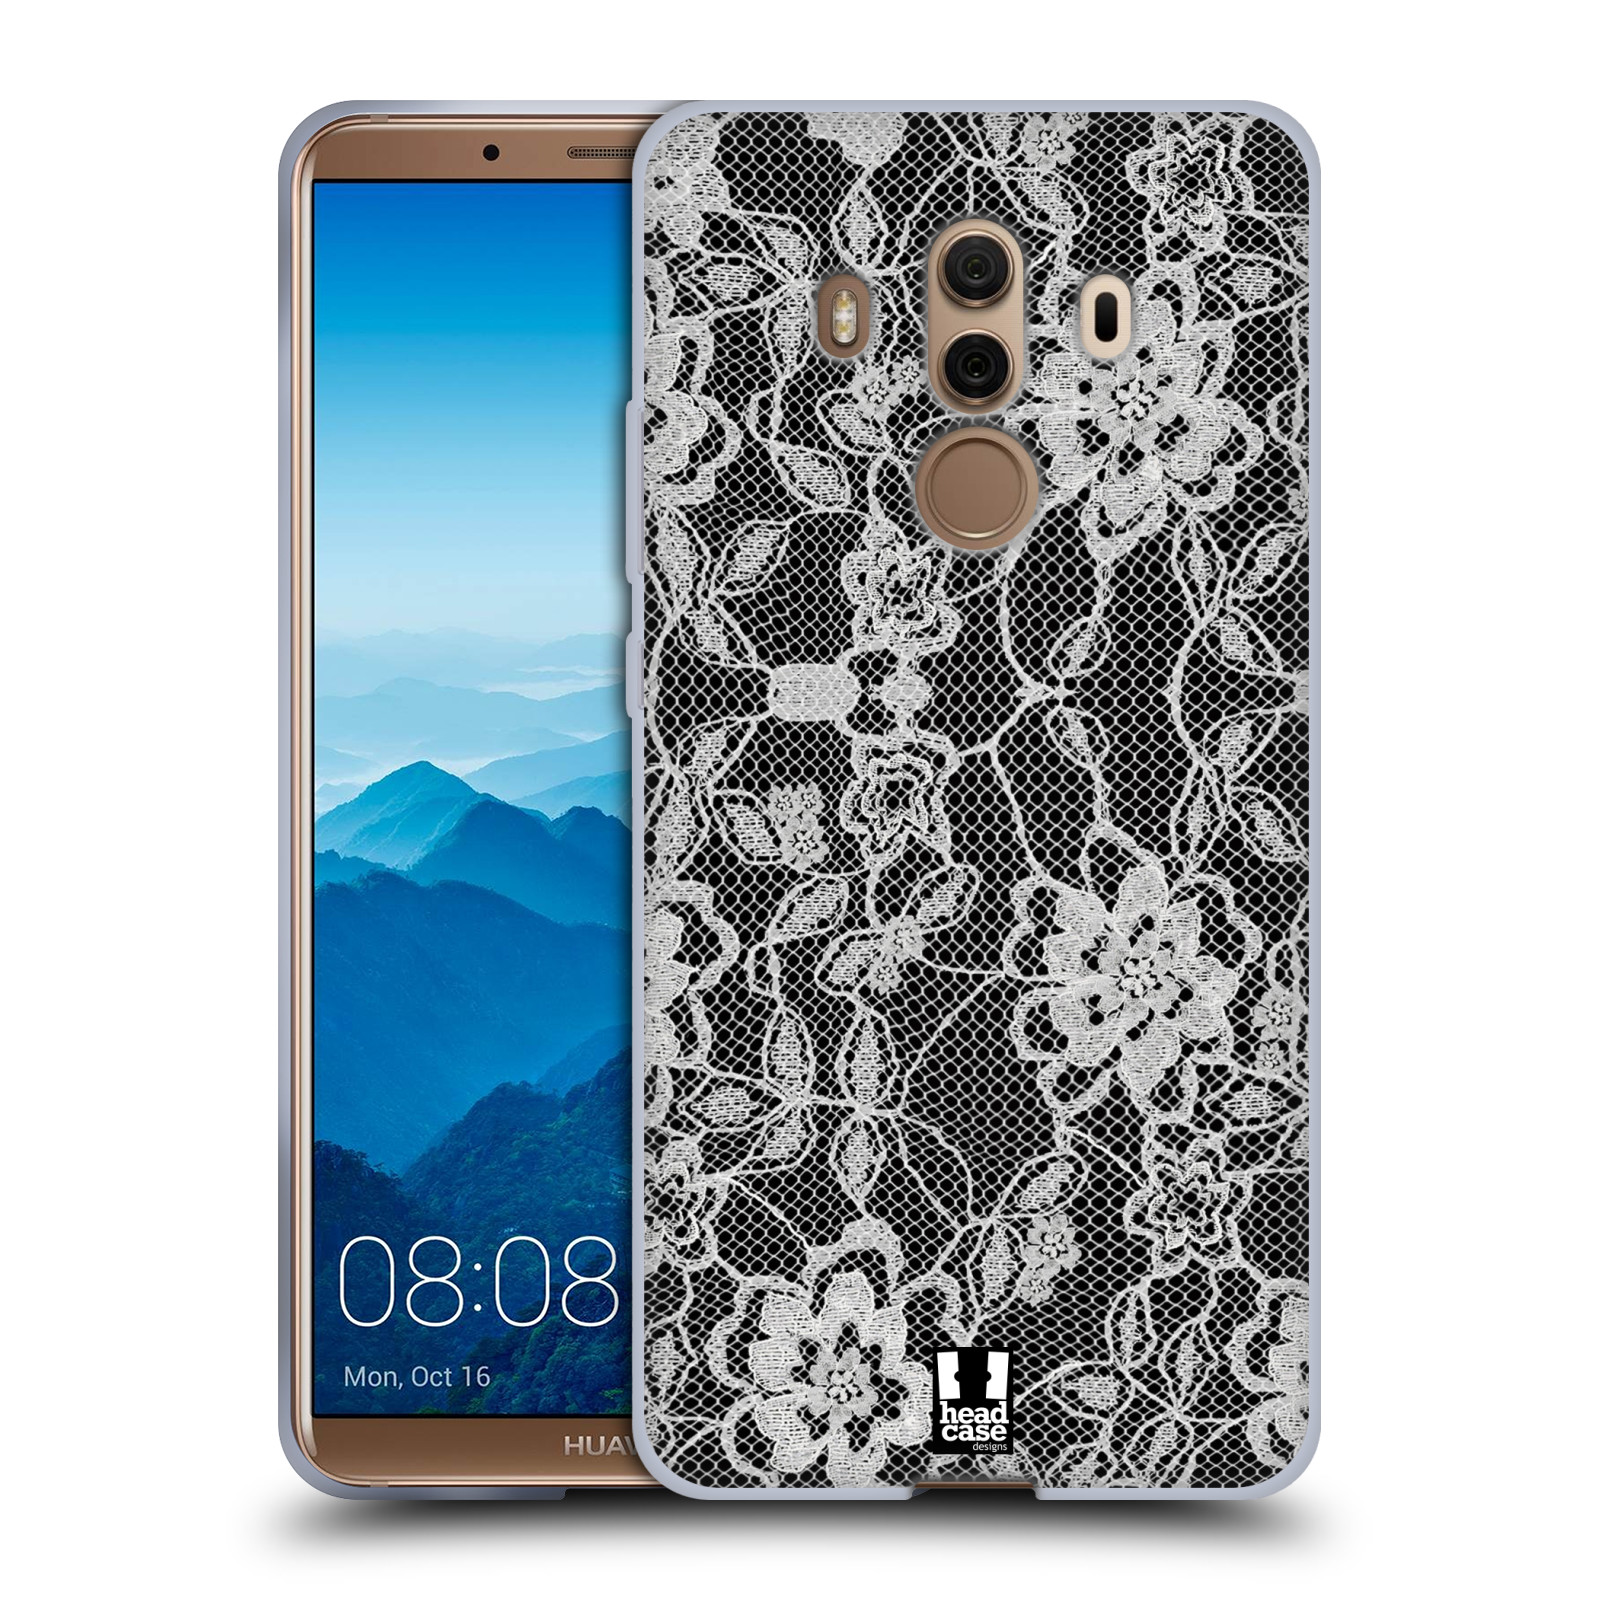 Silikonové pouzdro na mobil Huawei Mate 10 Pro - Head Case - FLOWERY KRAJKA